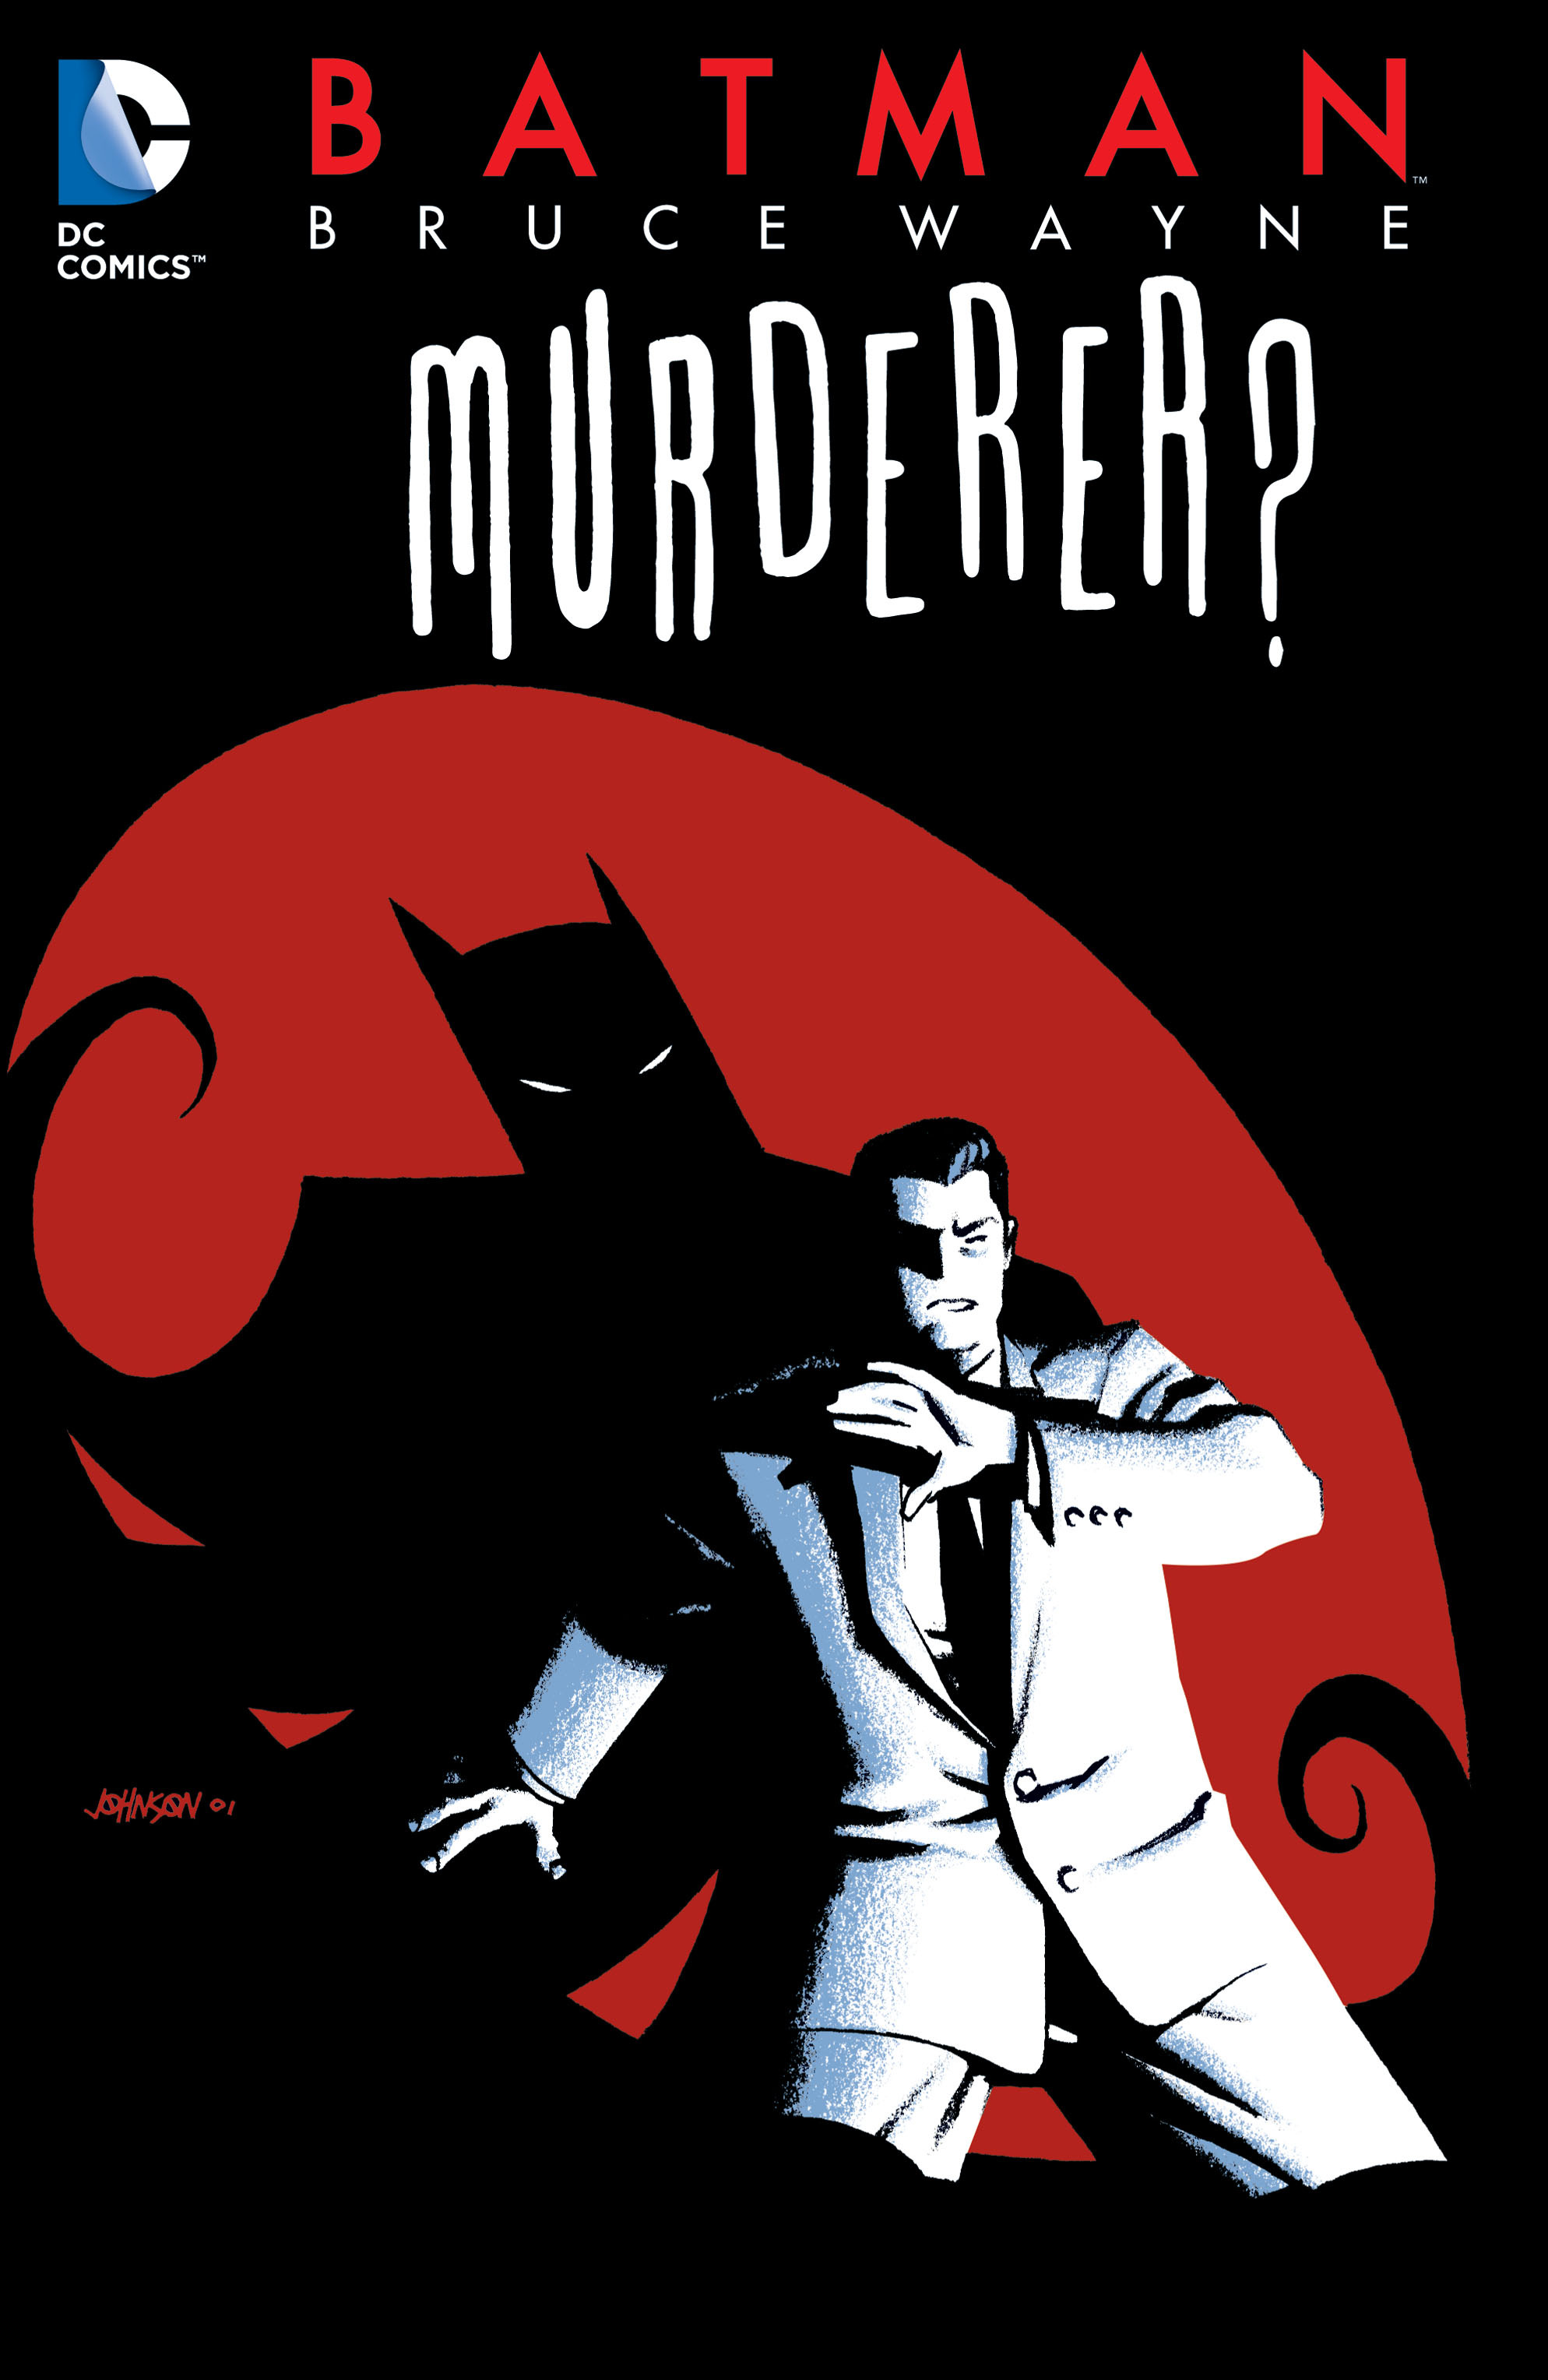 Batman: Bruce Wayne - Murderer? Part_1 Page 1